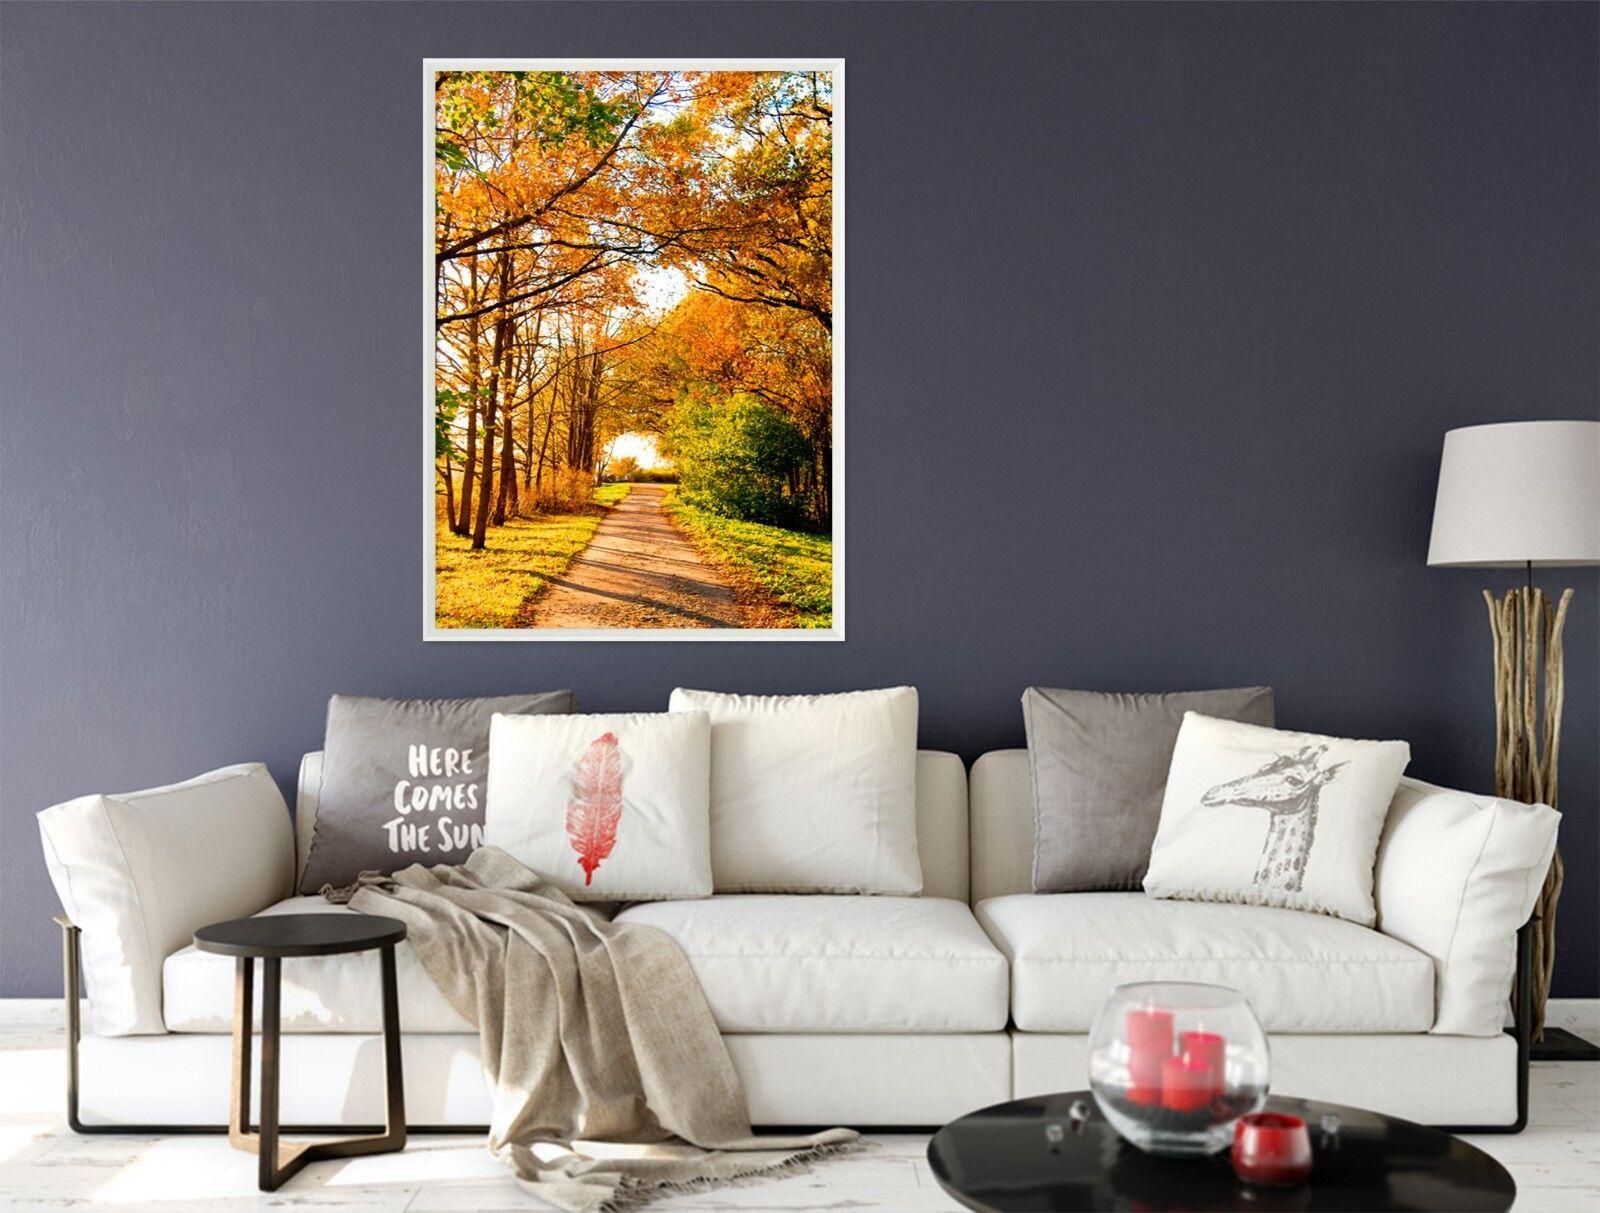 3D Herbst Ahorn Straße 6 Gerahmt Poster Daheim Dekor Drucken Malerei Kunst AJ